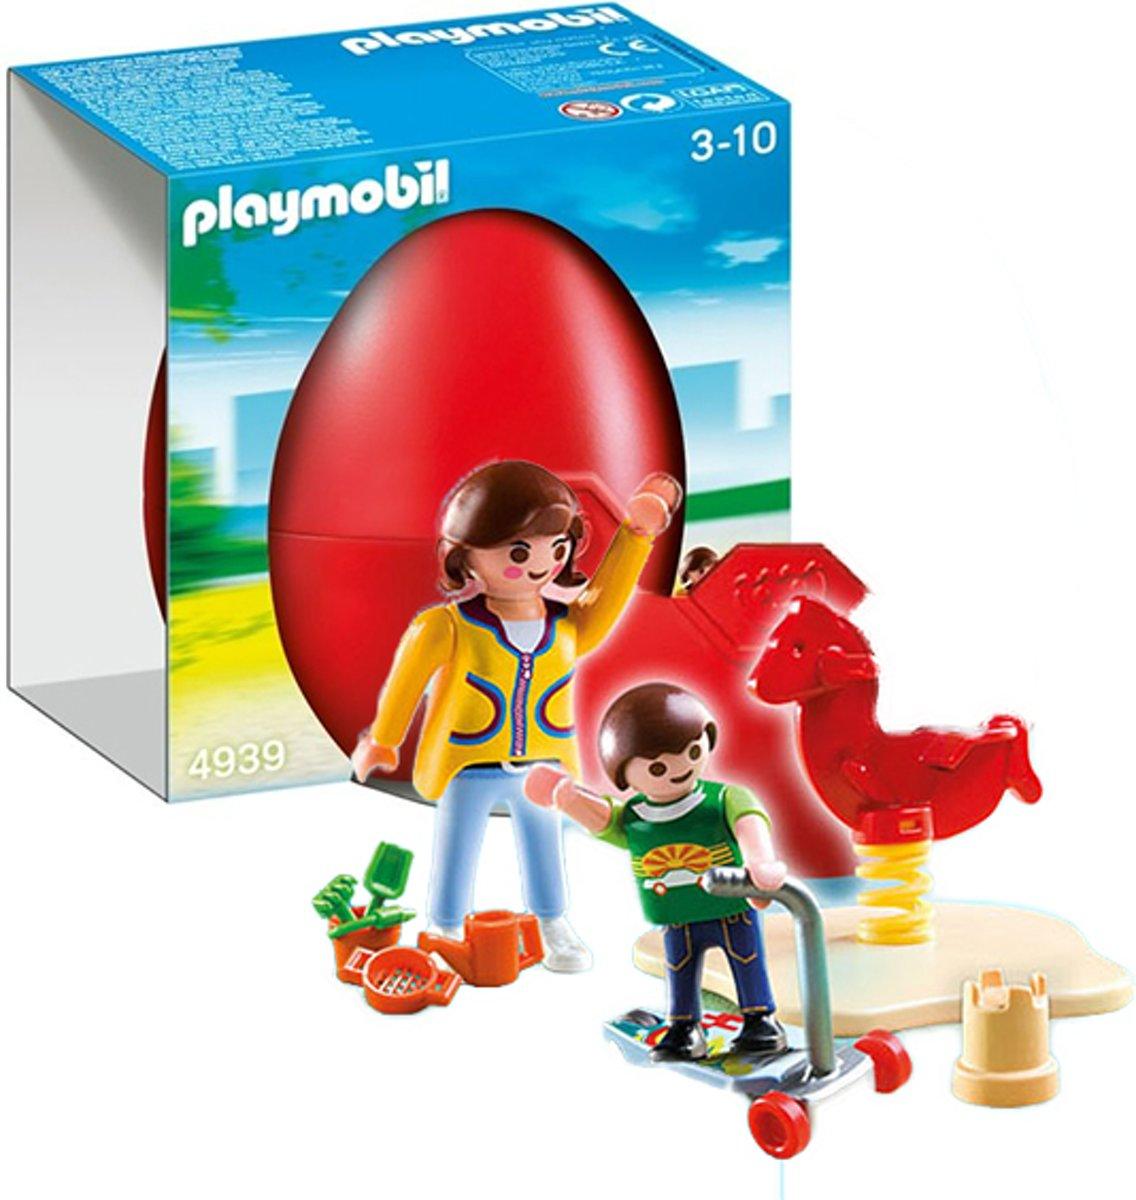 Playmobil Ei Speeltuin - 4939